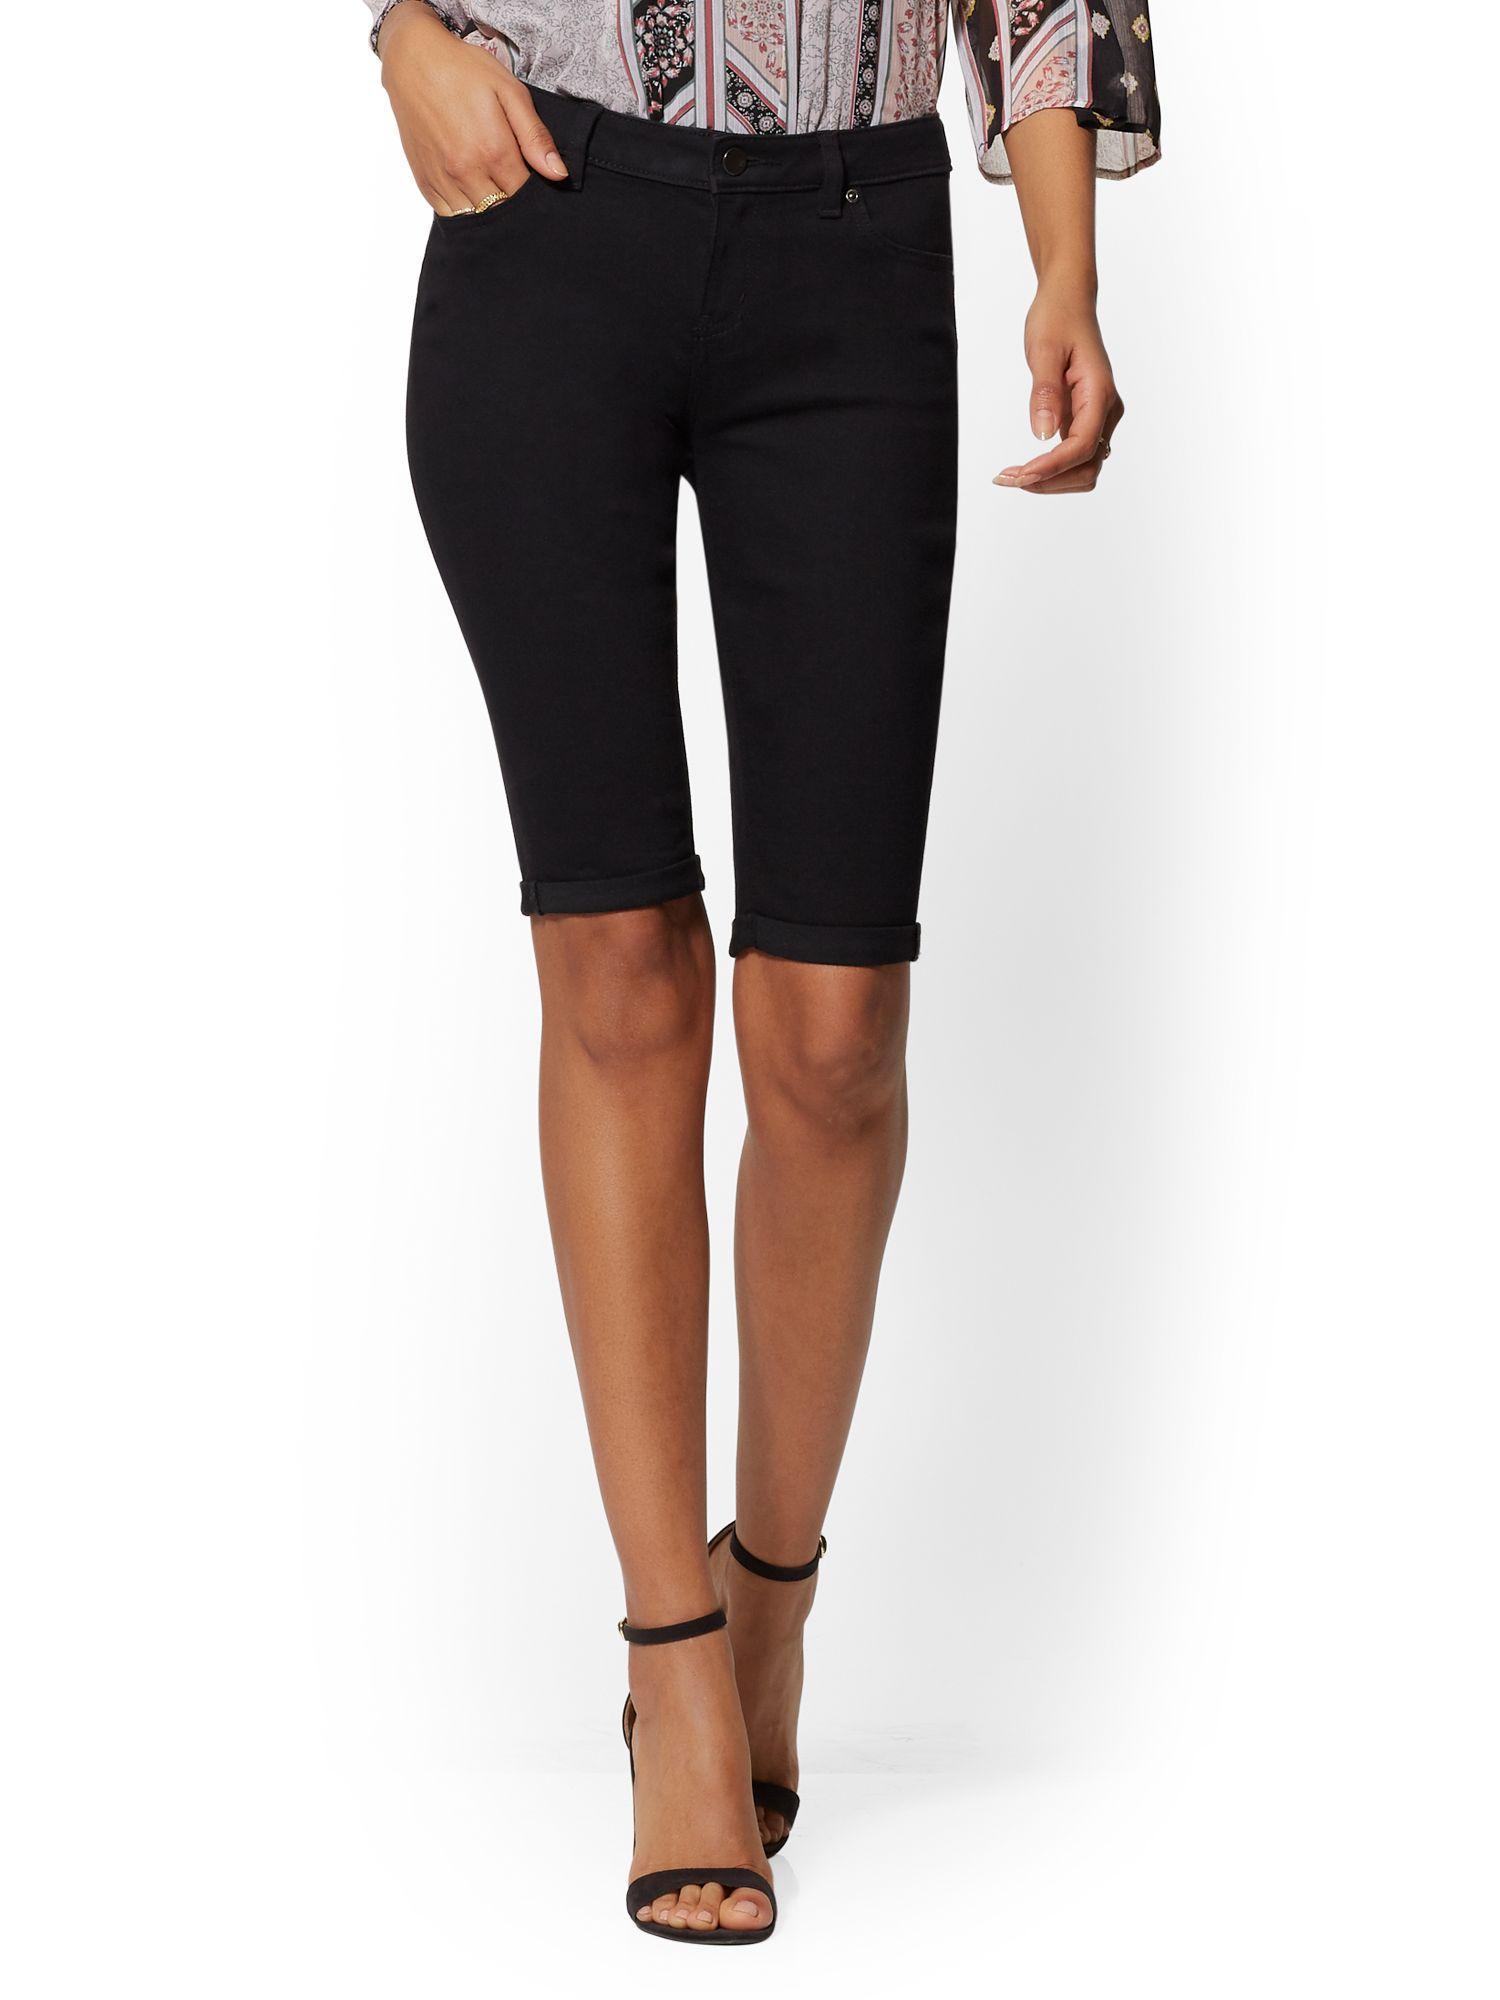 b85c9aa06b New York   Company. Women s Curvy 13 Inch Bermuda Short - Black - Soho Jeans